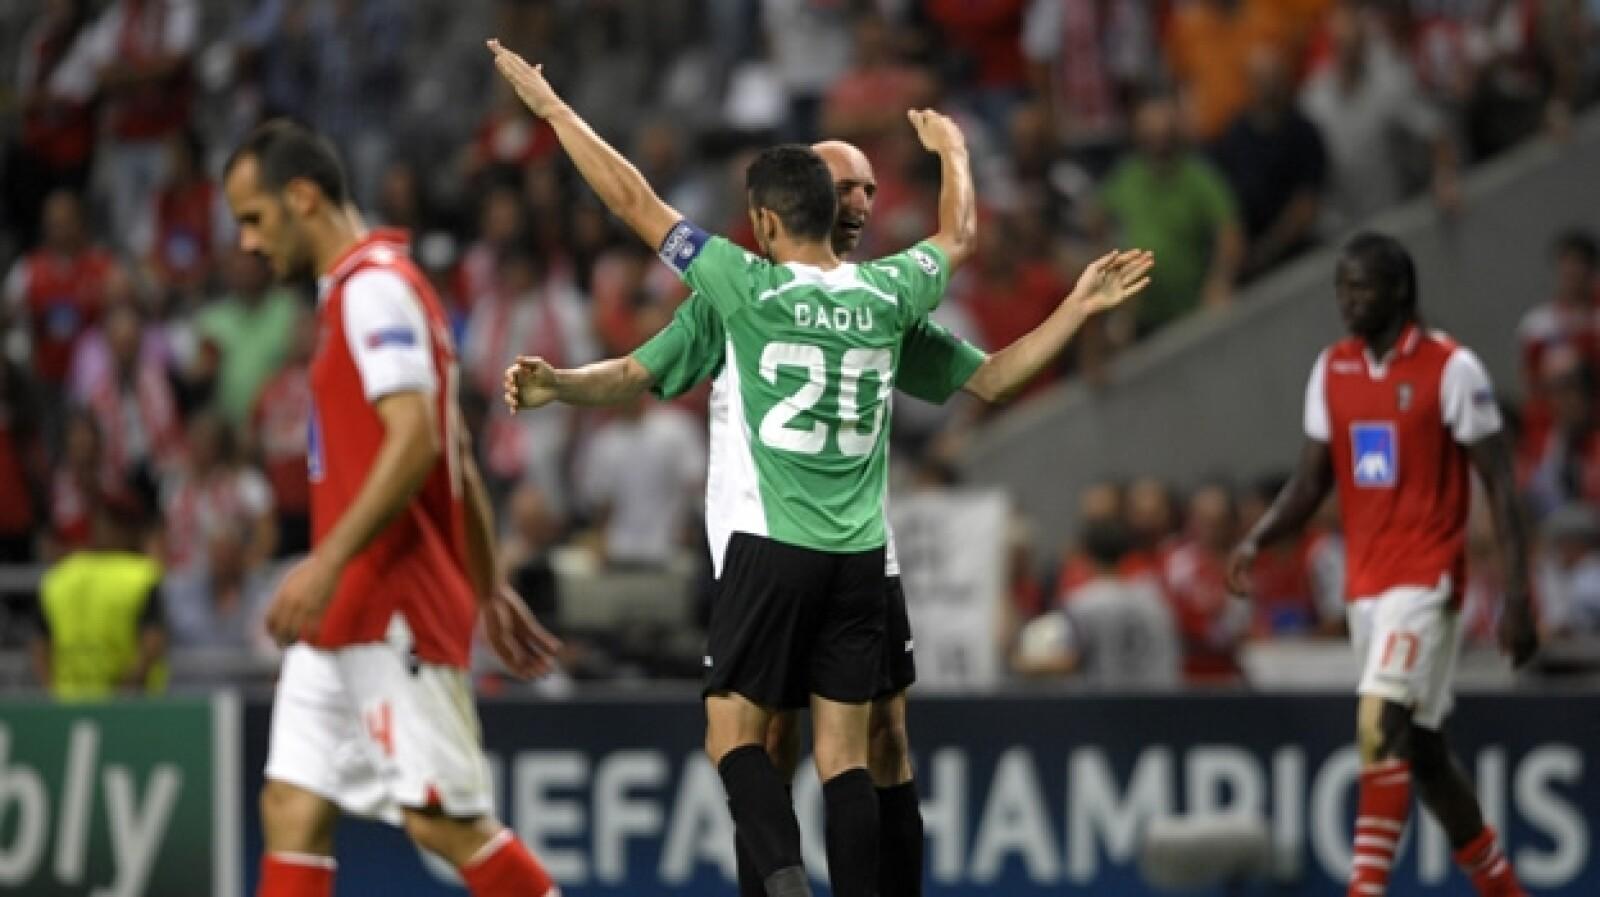 Braga vs. CFR Cluj